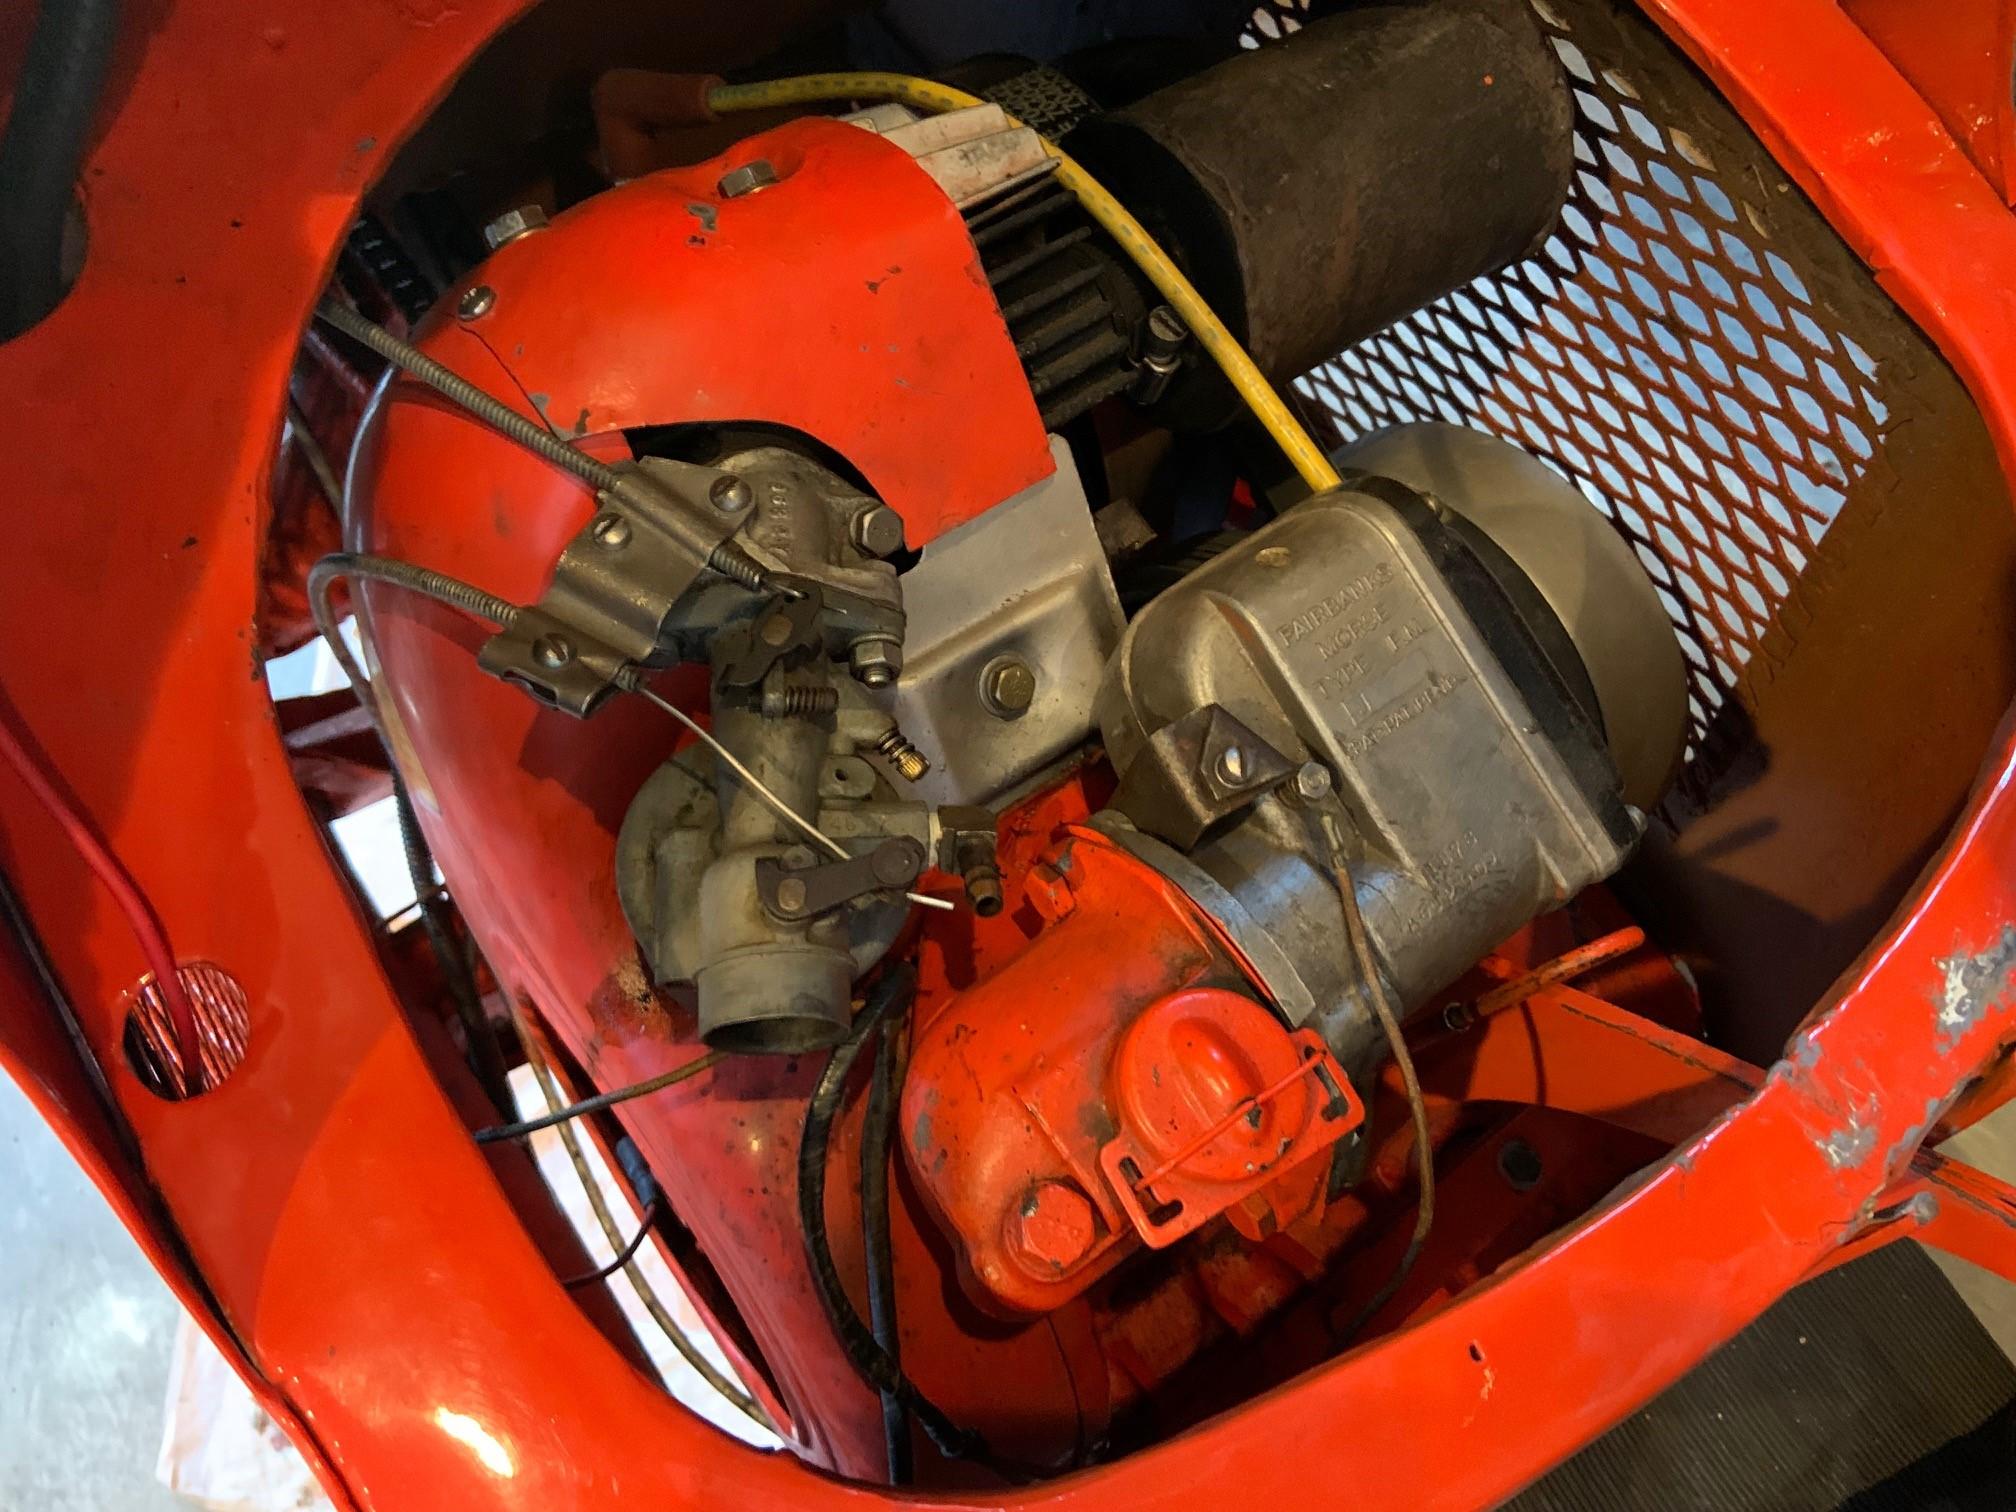 Josh Rogers - 1947 Salsbury - engine